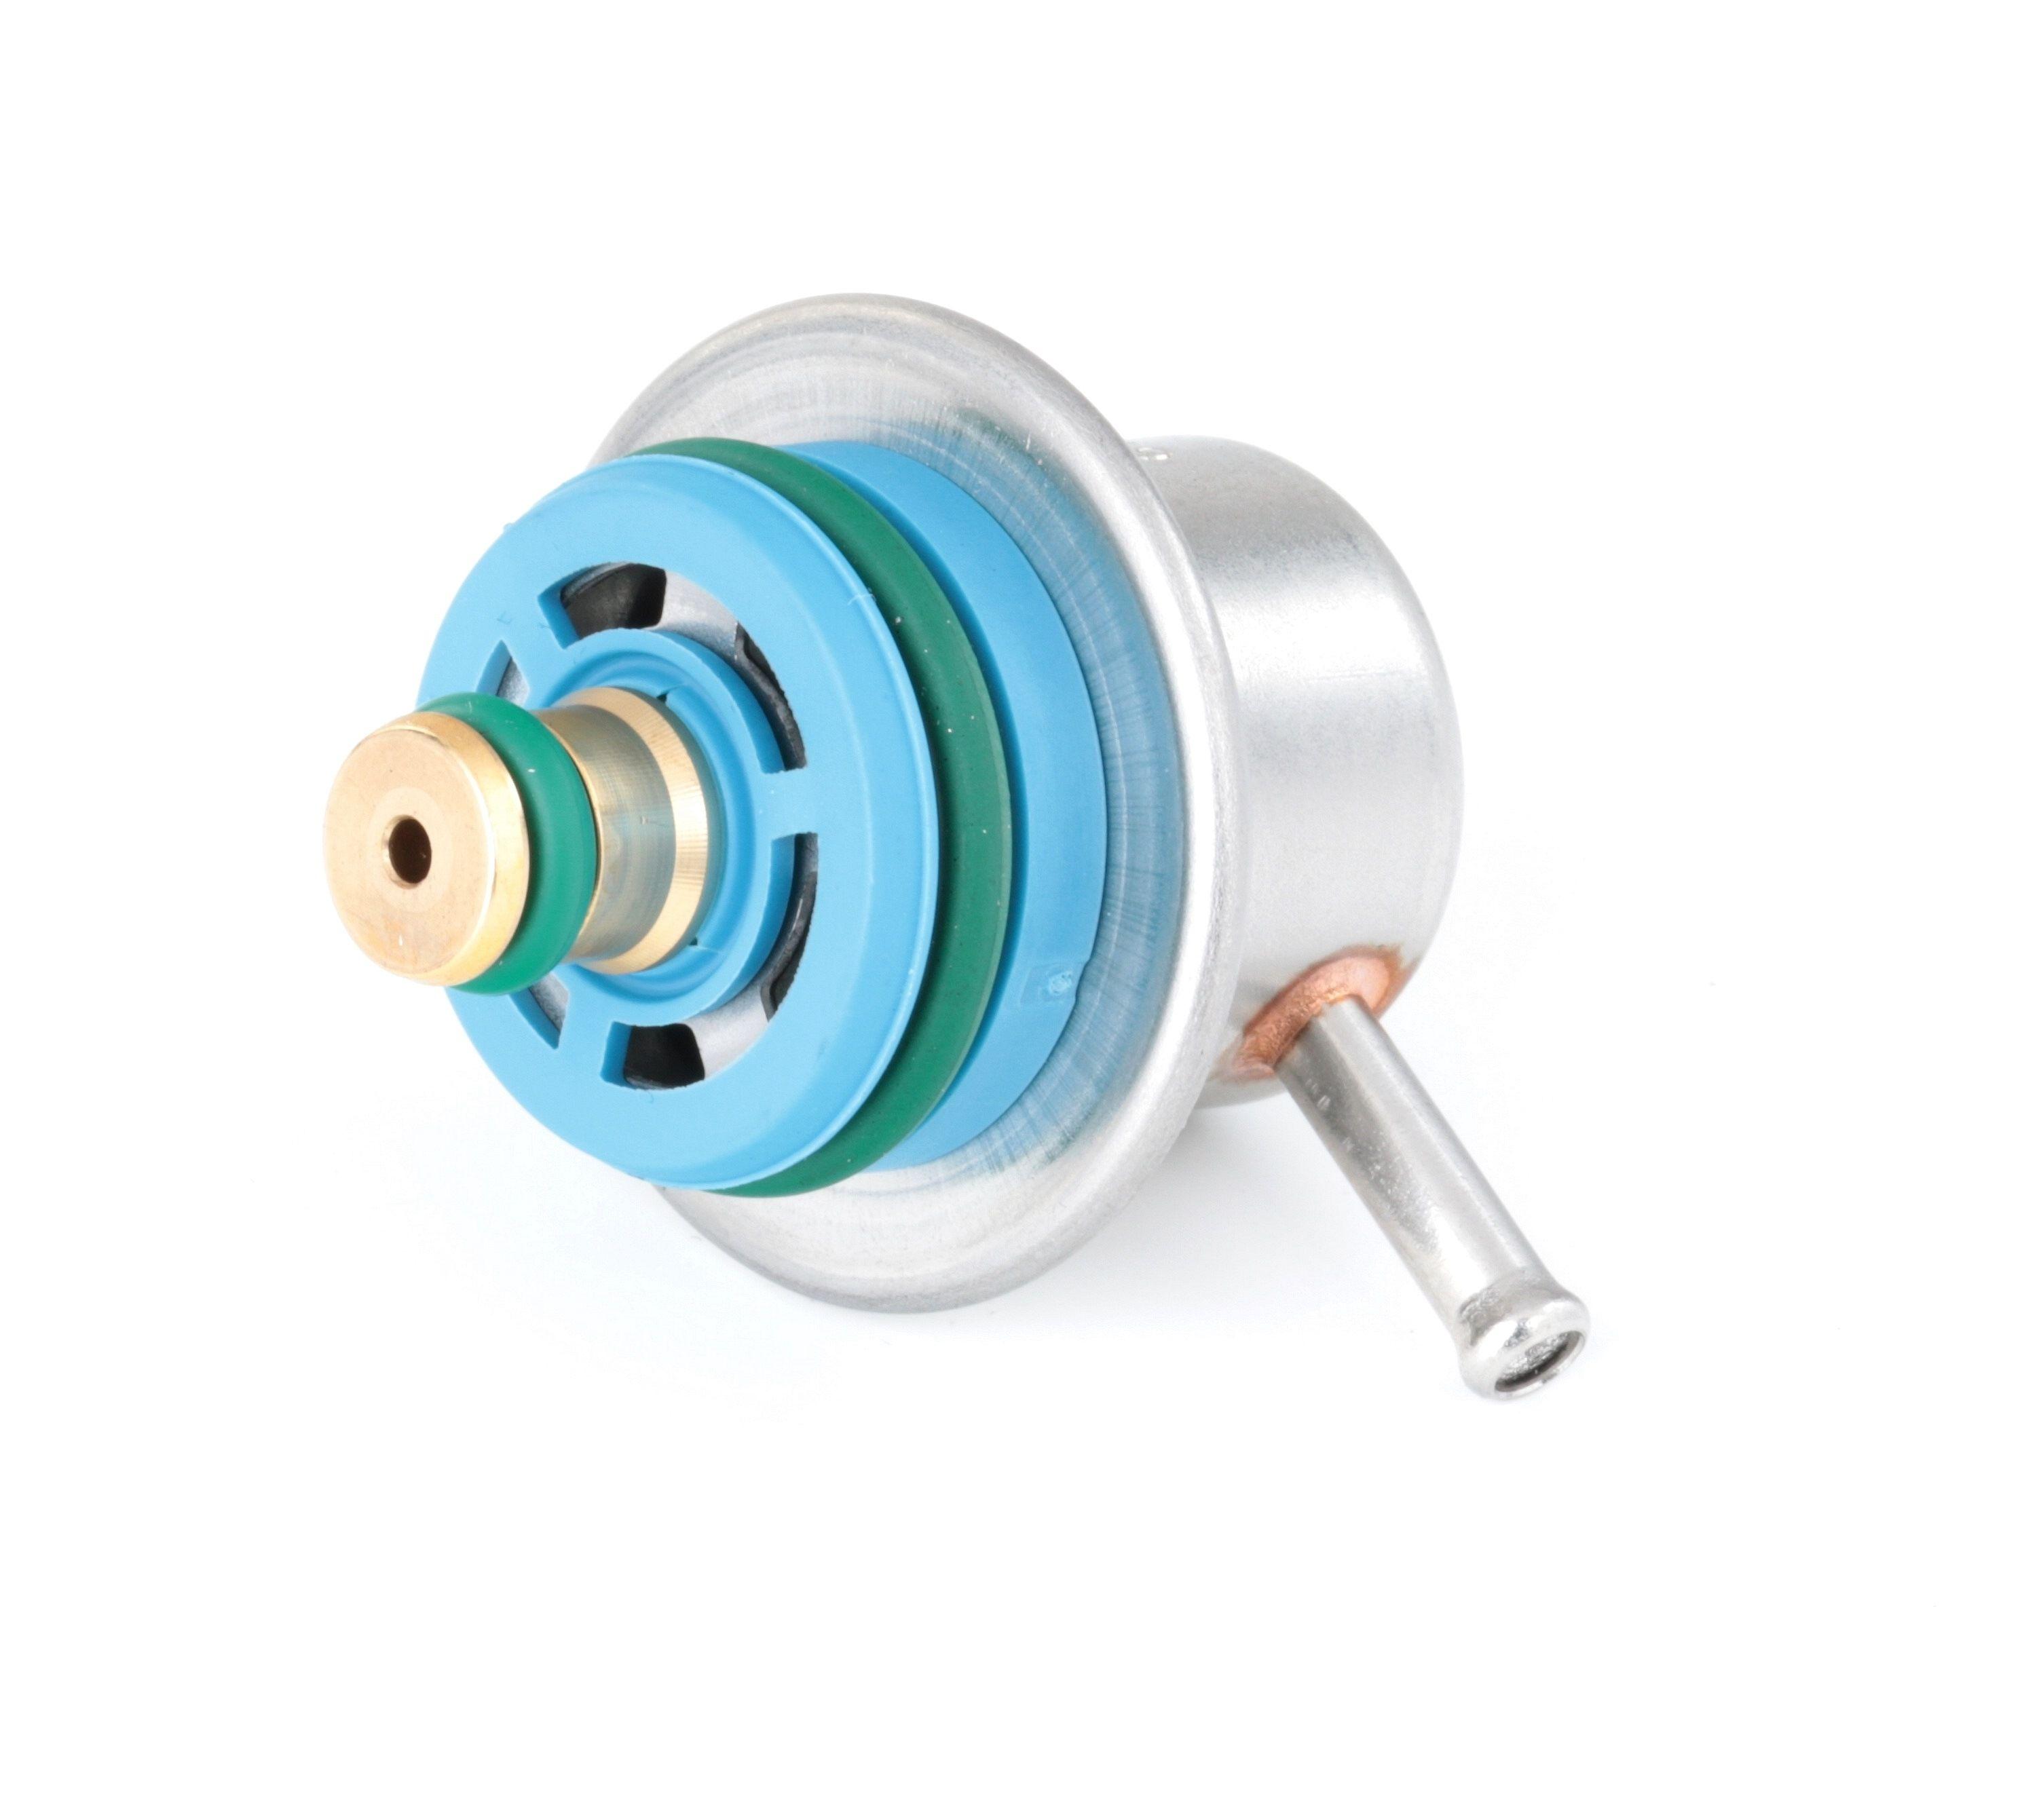 Kraftstoffdruckregler BOSCH 0 280 160 560 Bewertung